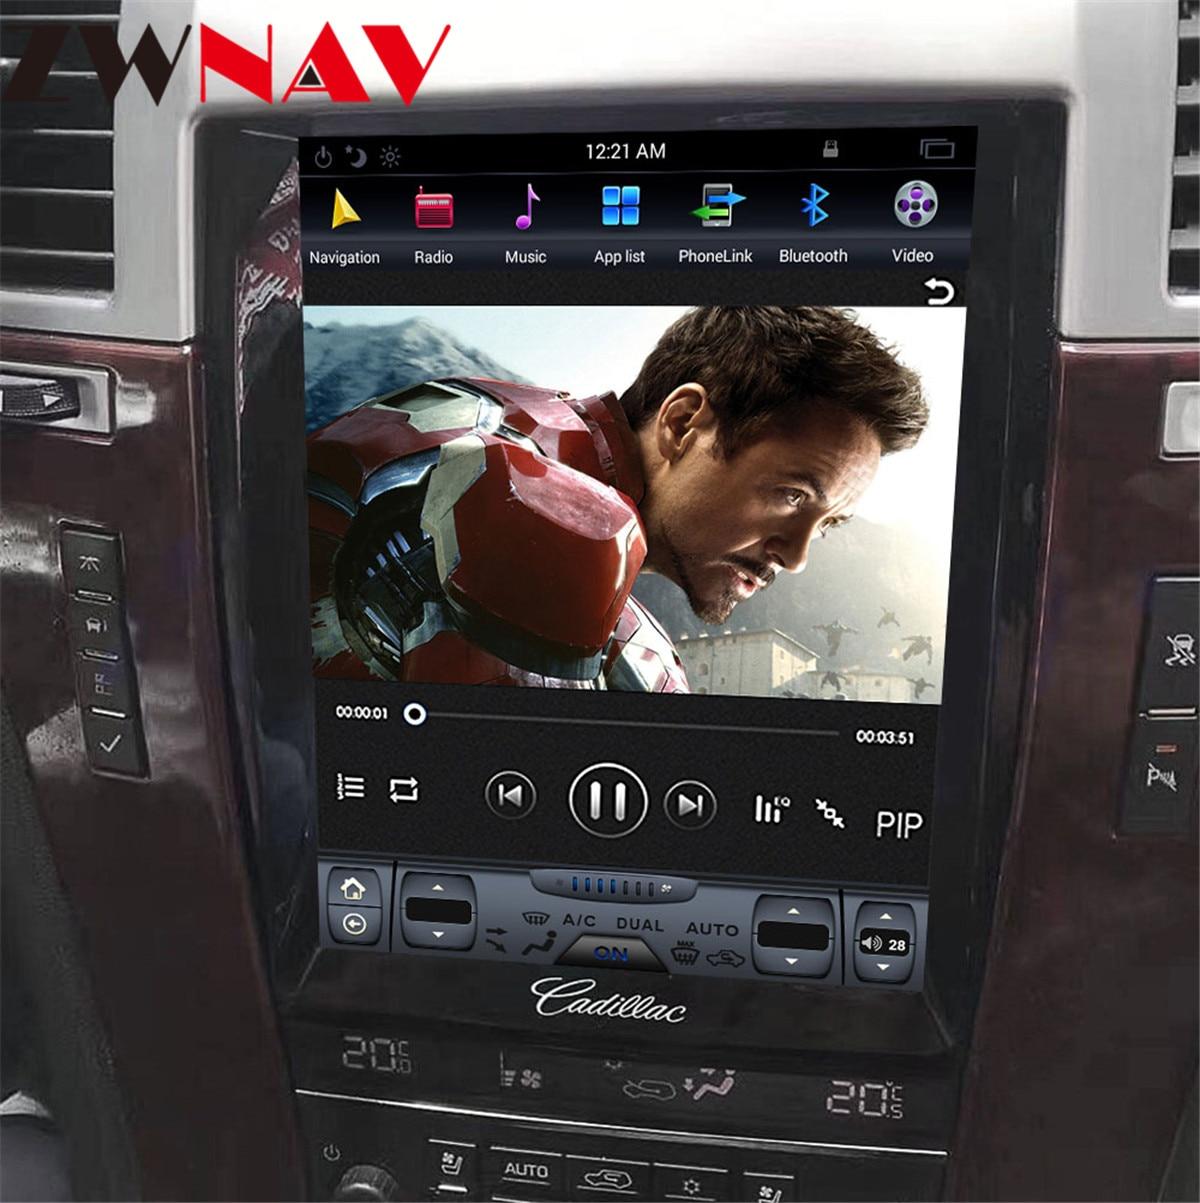 Tesla vertic écran Android 8.1 voiture DVD multimédia pour Cadillac Escalade 2007-2012 Auto Audio vidéo Radio stéréo GPS Navi 1 din